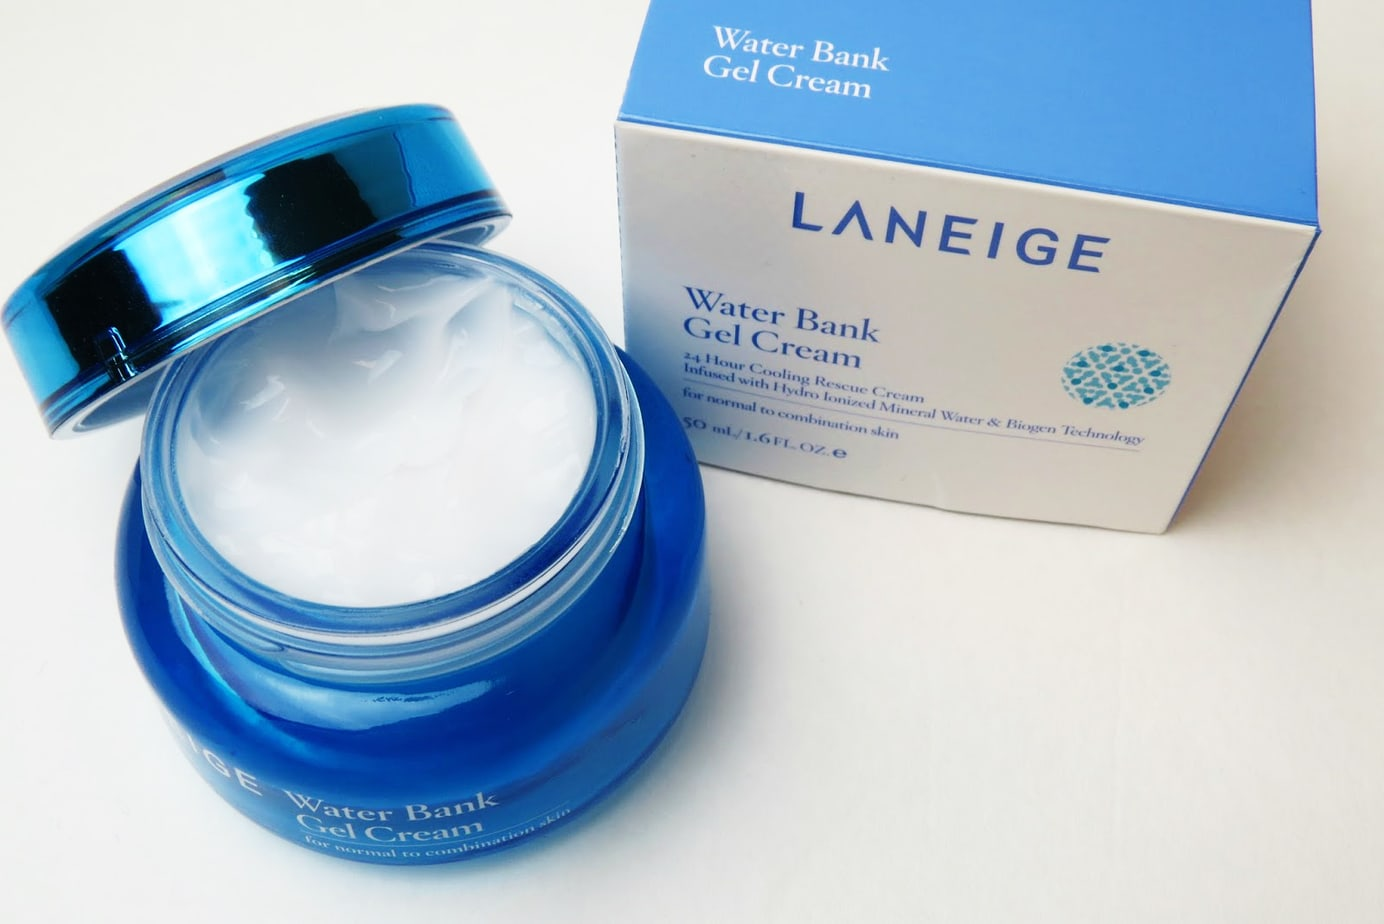 laneige-water-bank-gel-cream-1